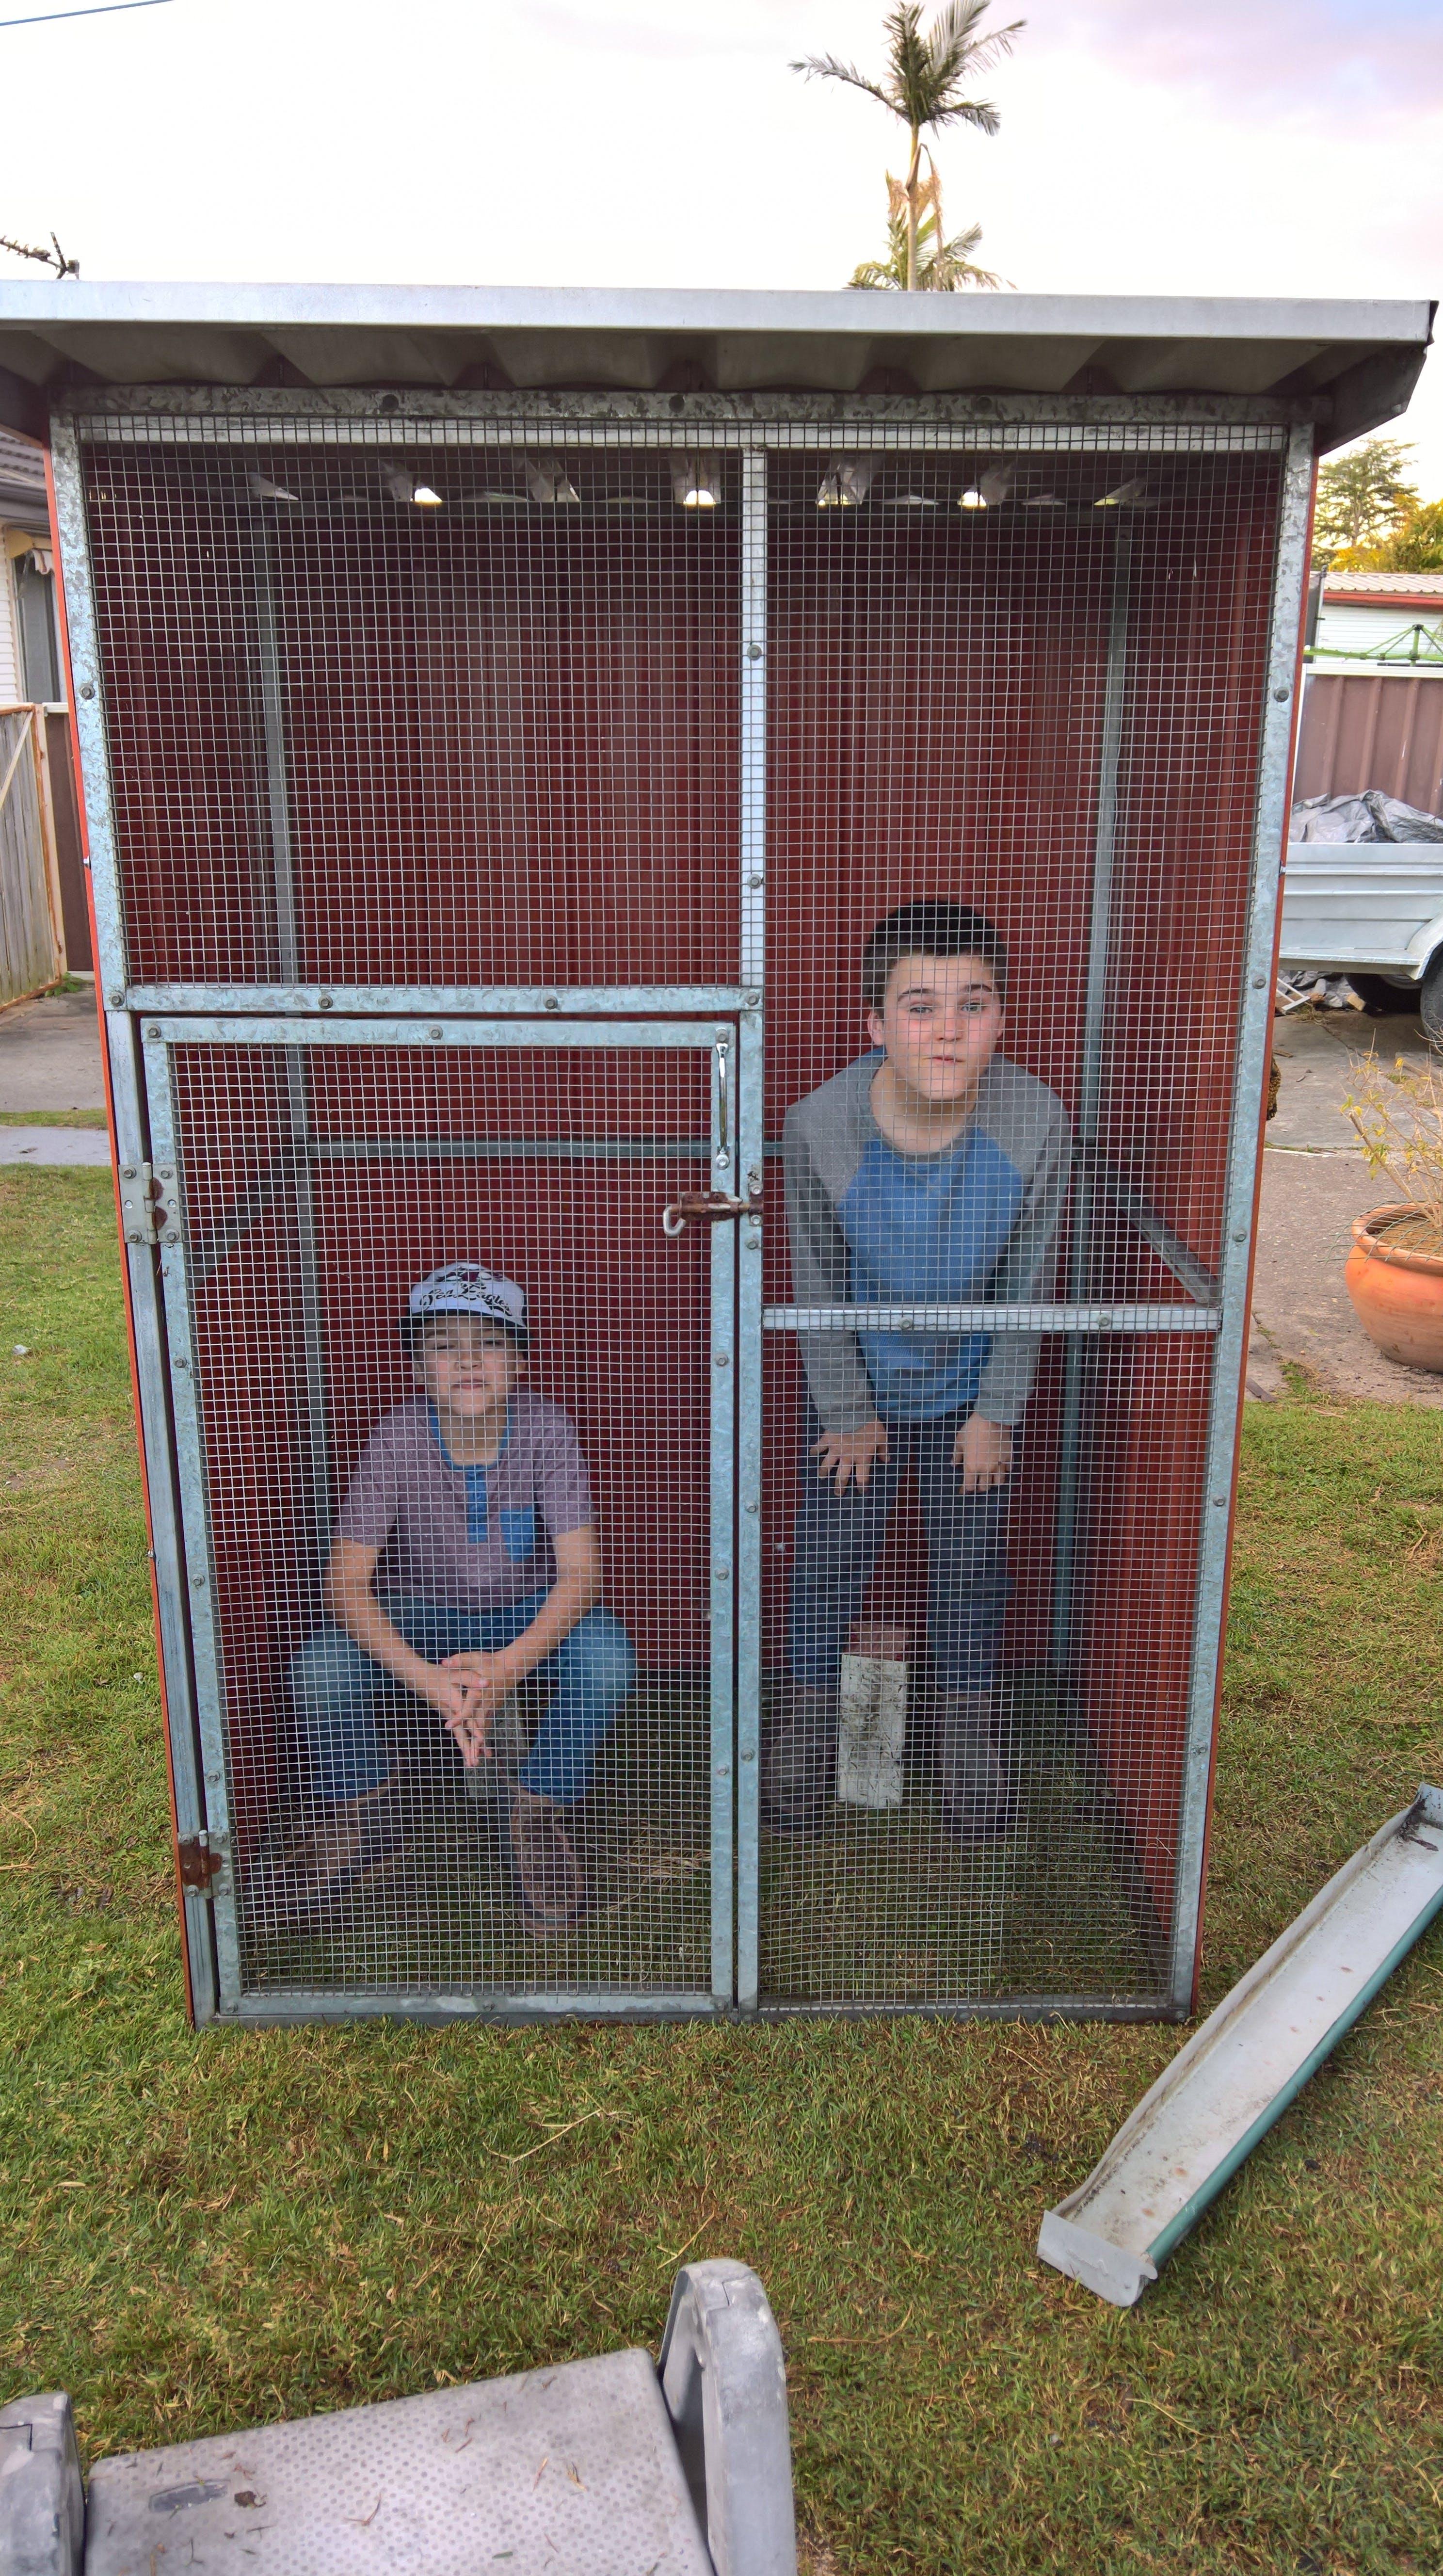 Free stock photo of bird aviary, caged animals, kids